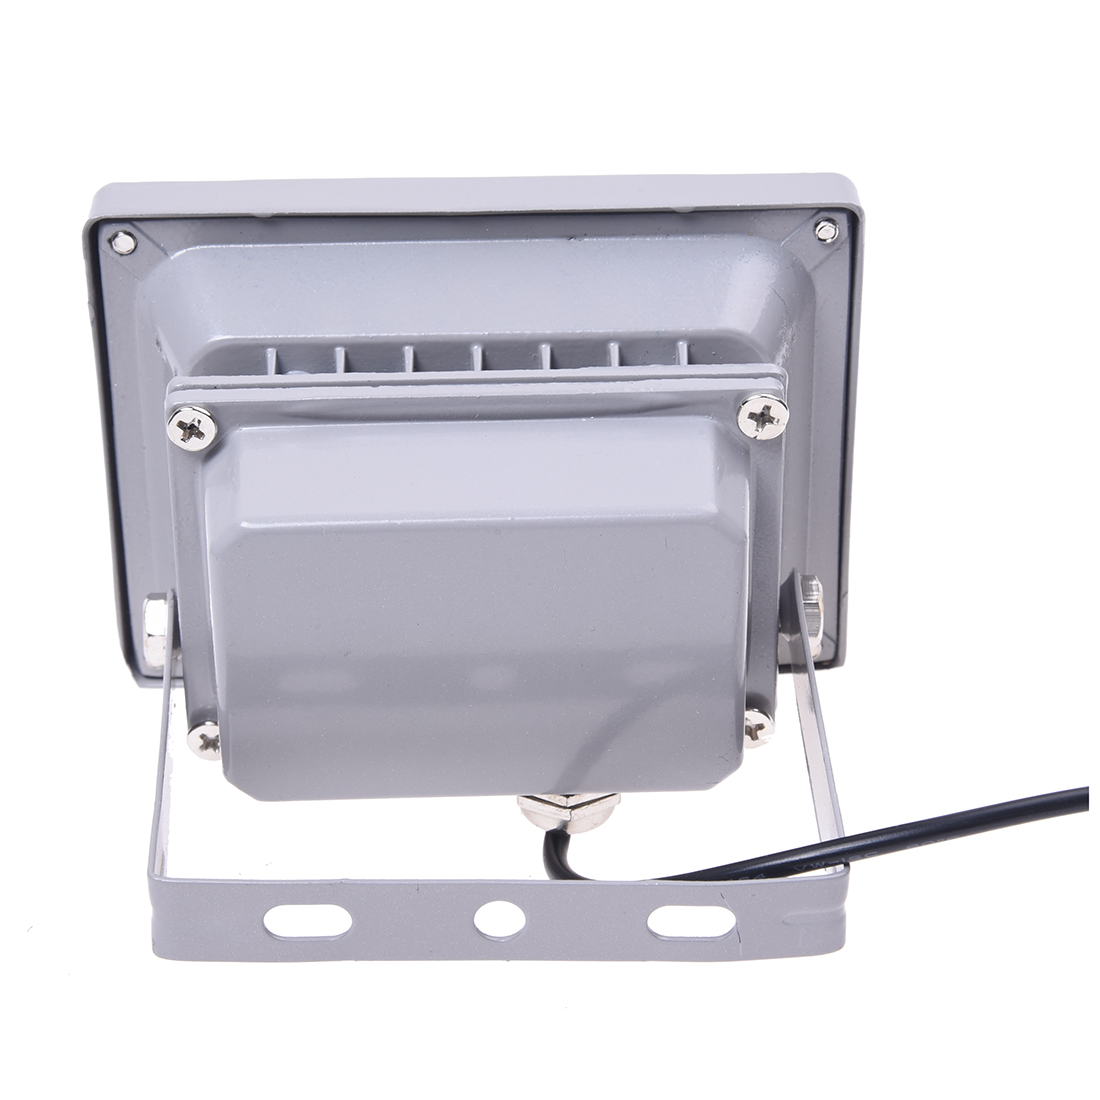 Spotlight Headlight: HEADLIGHT HEADLAMP CAR SPOTLIGHT 12V LED 10W 7000K WHITE